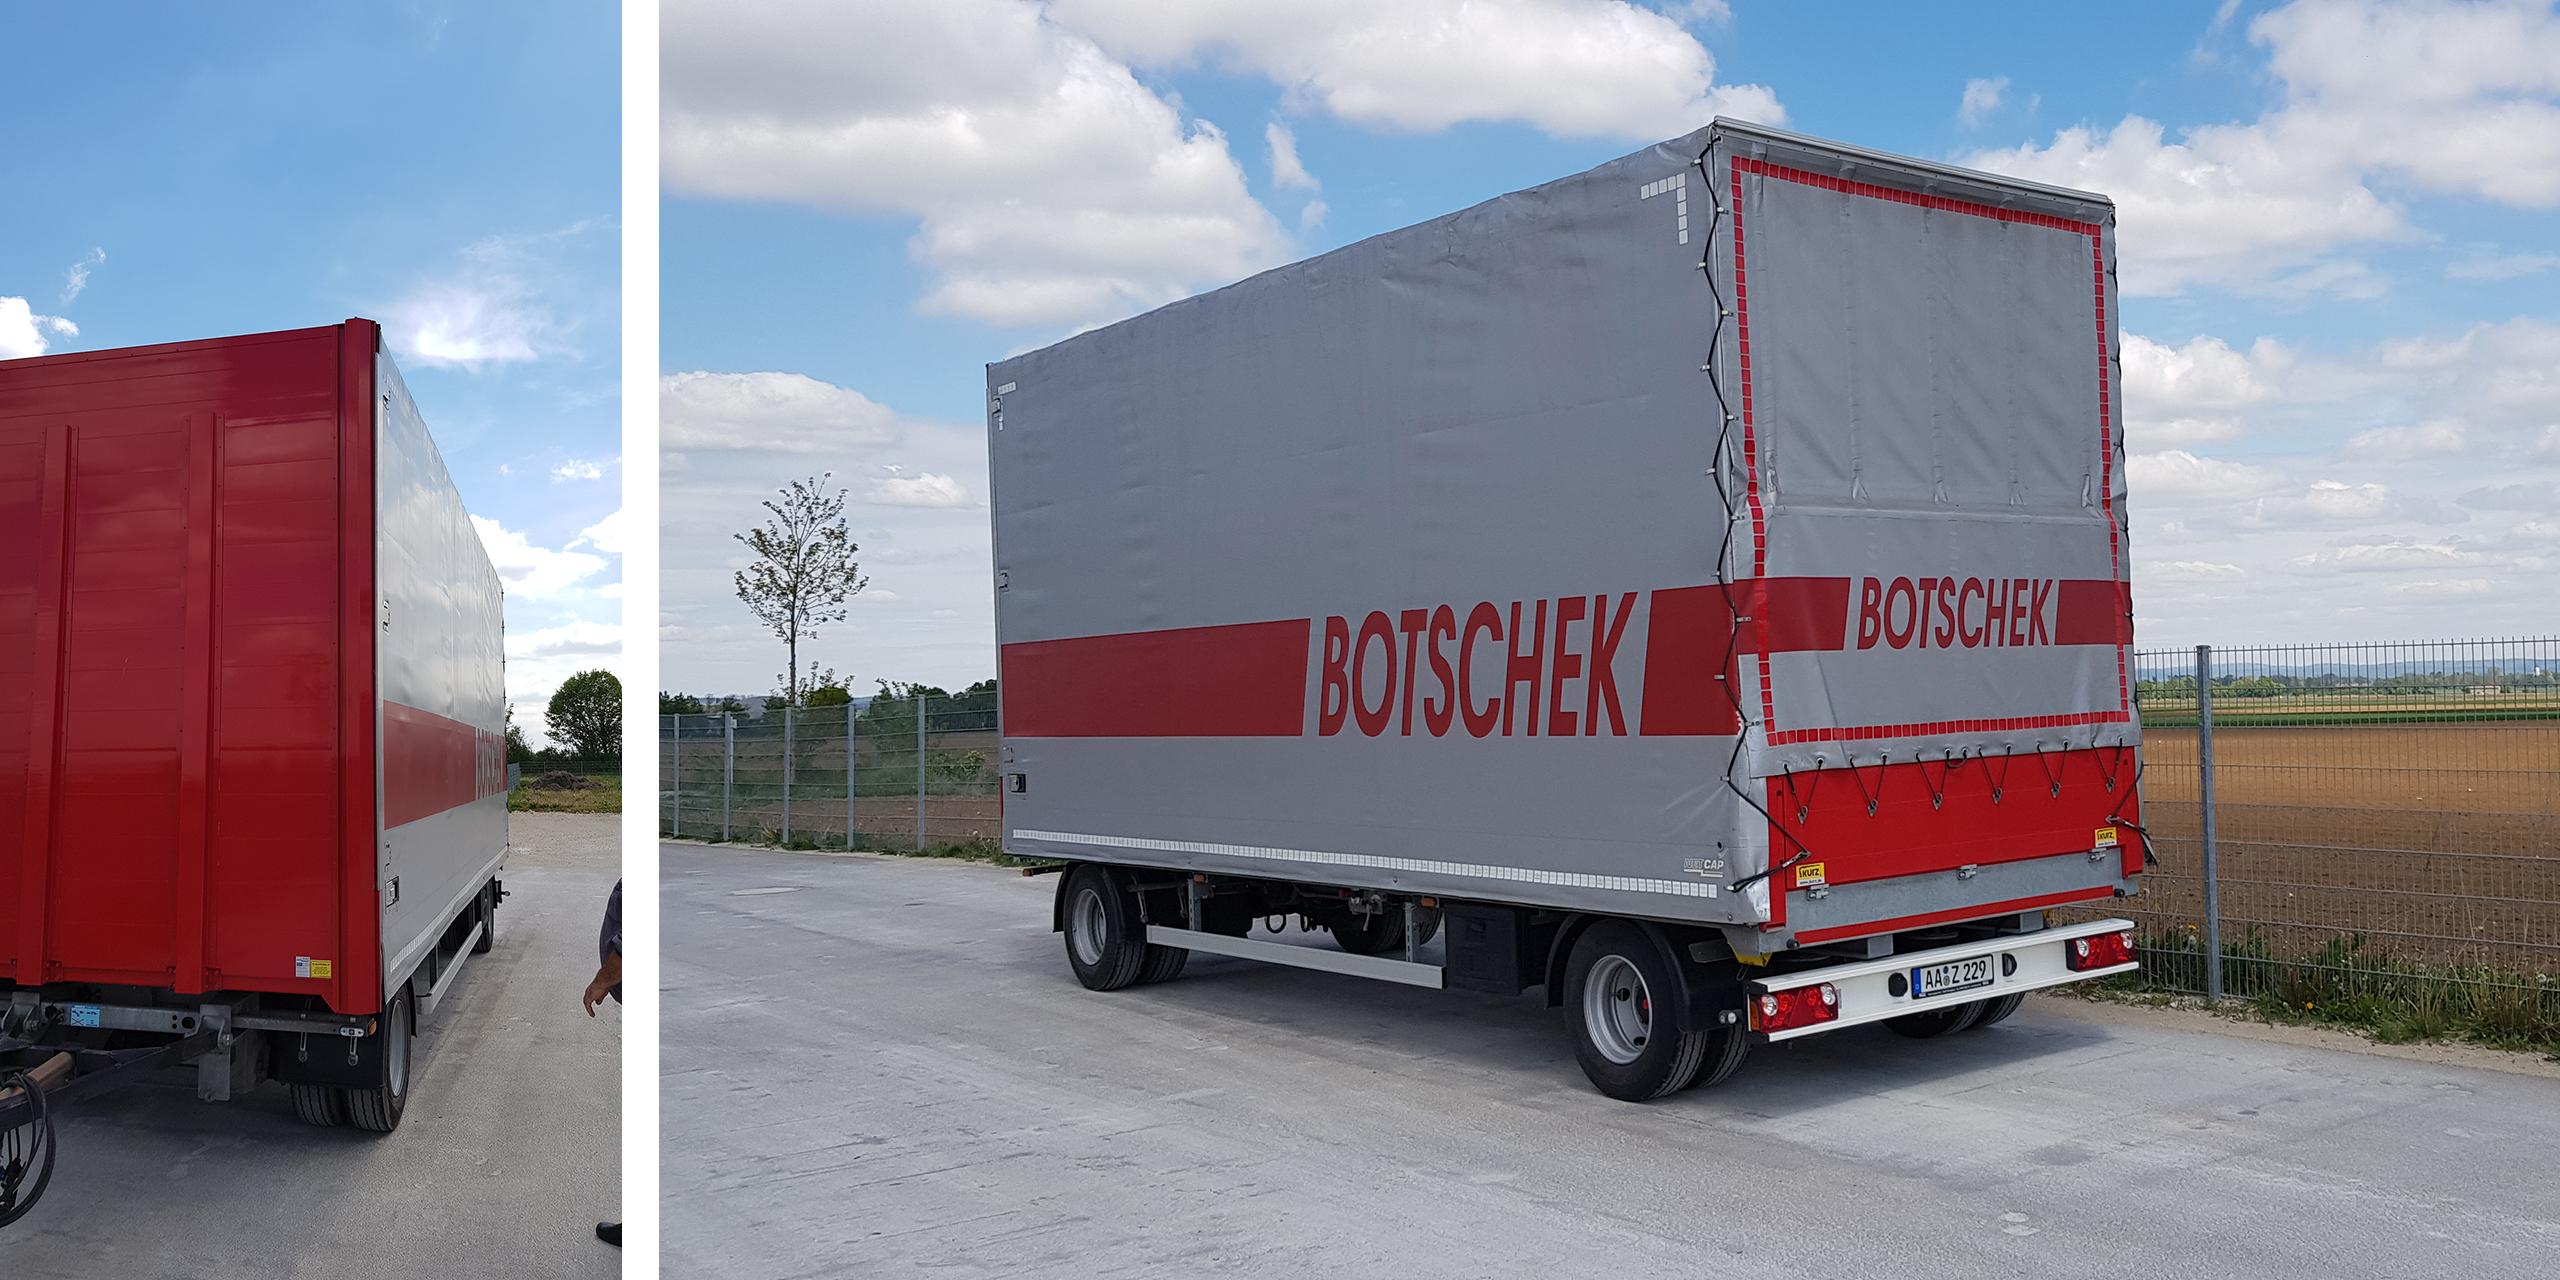 Botschek